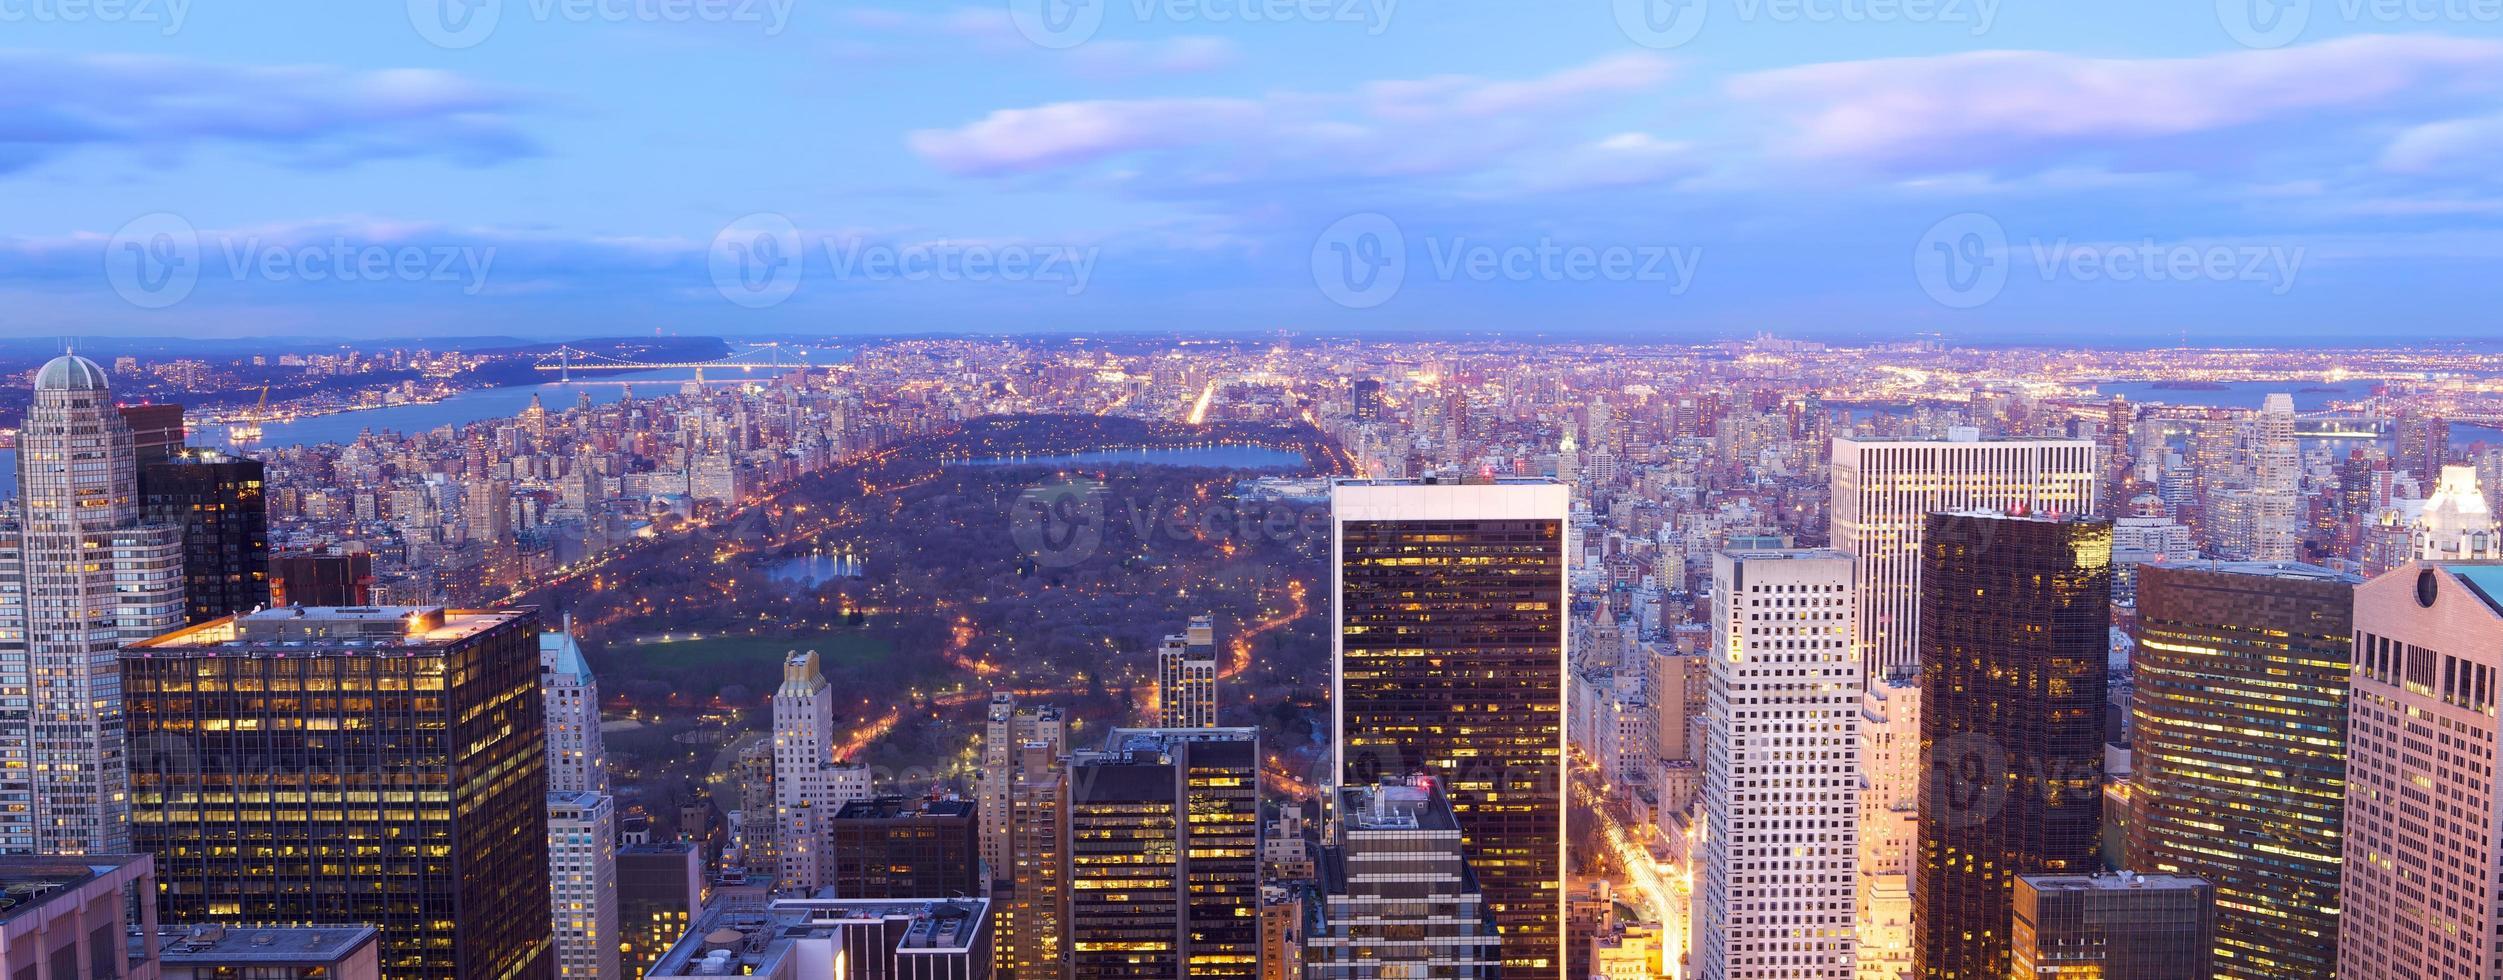 central park flygfoto panorama foto